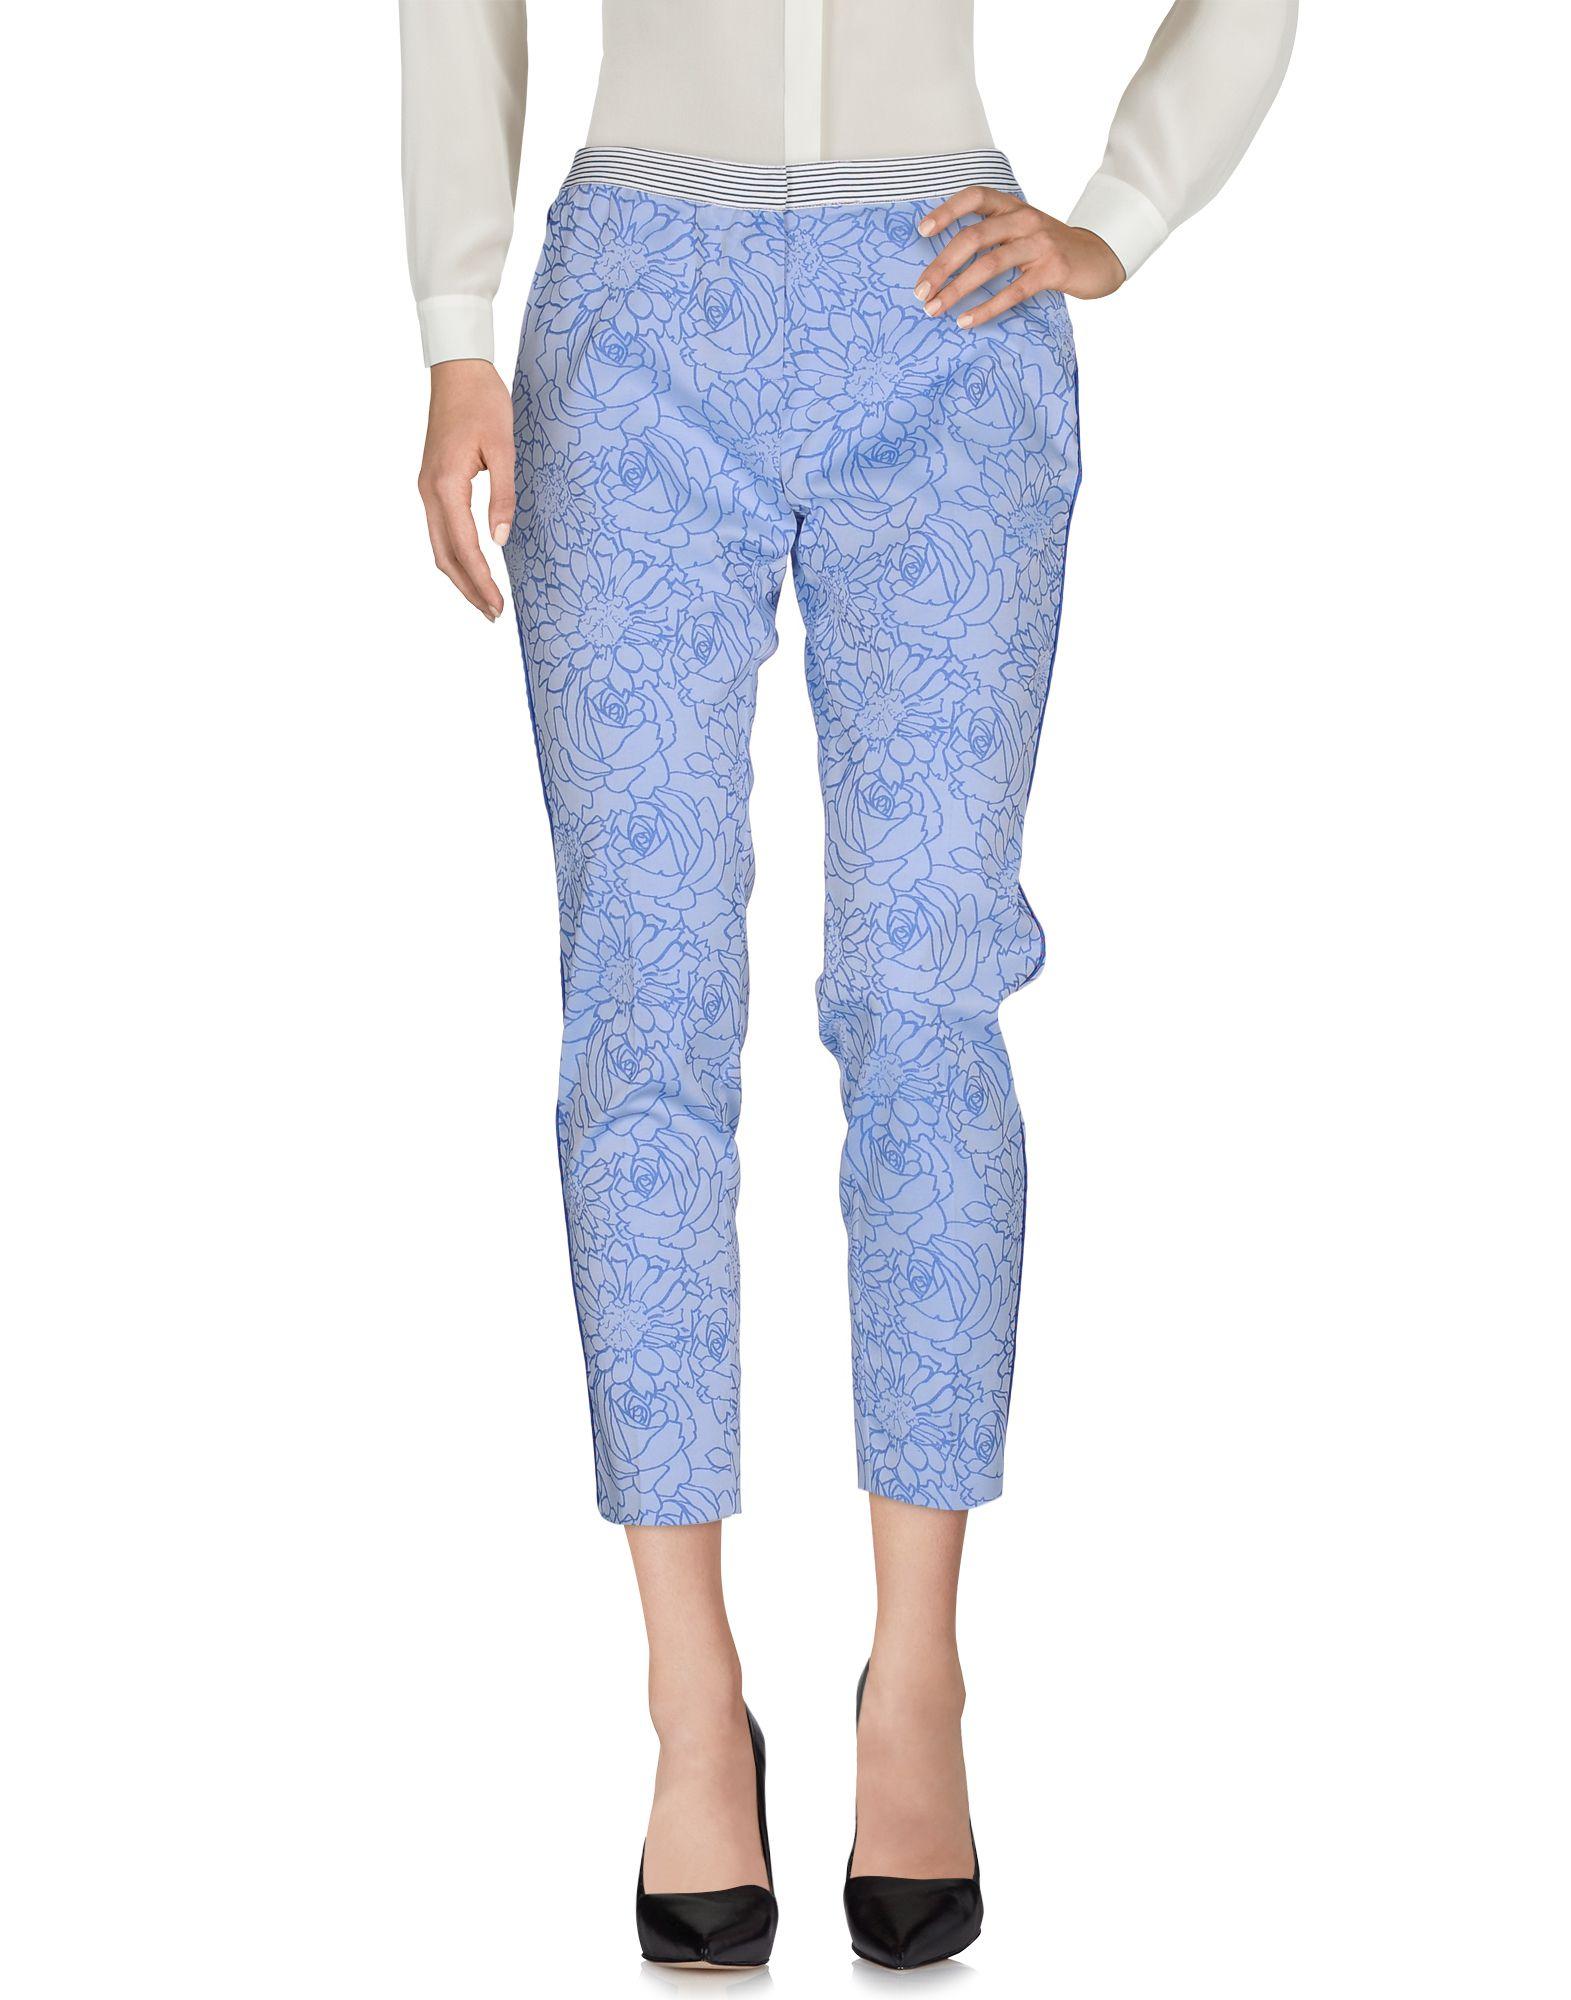 TERESA DAINELLI Casual Pants in Sky Blue